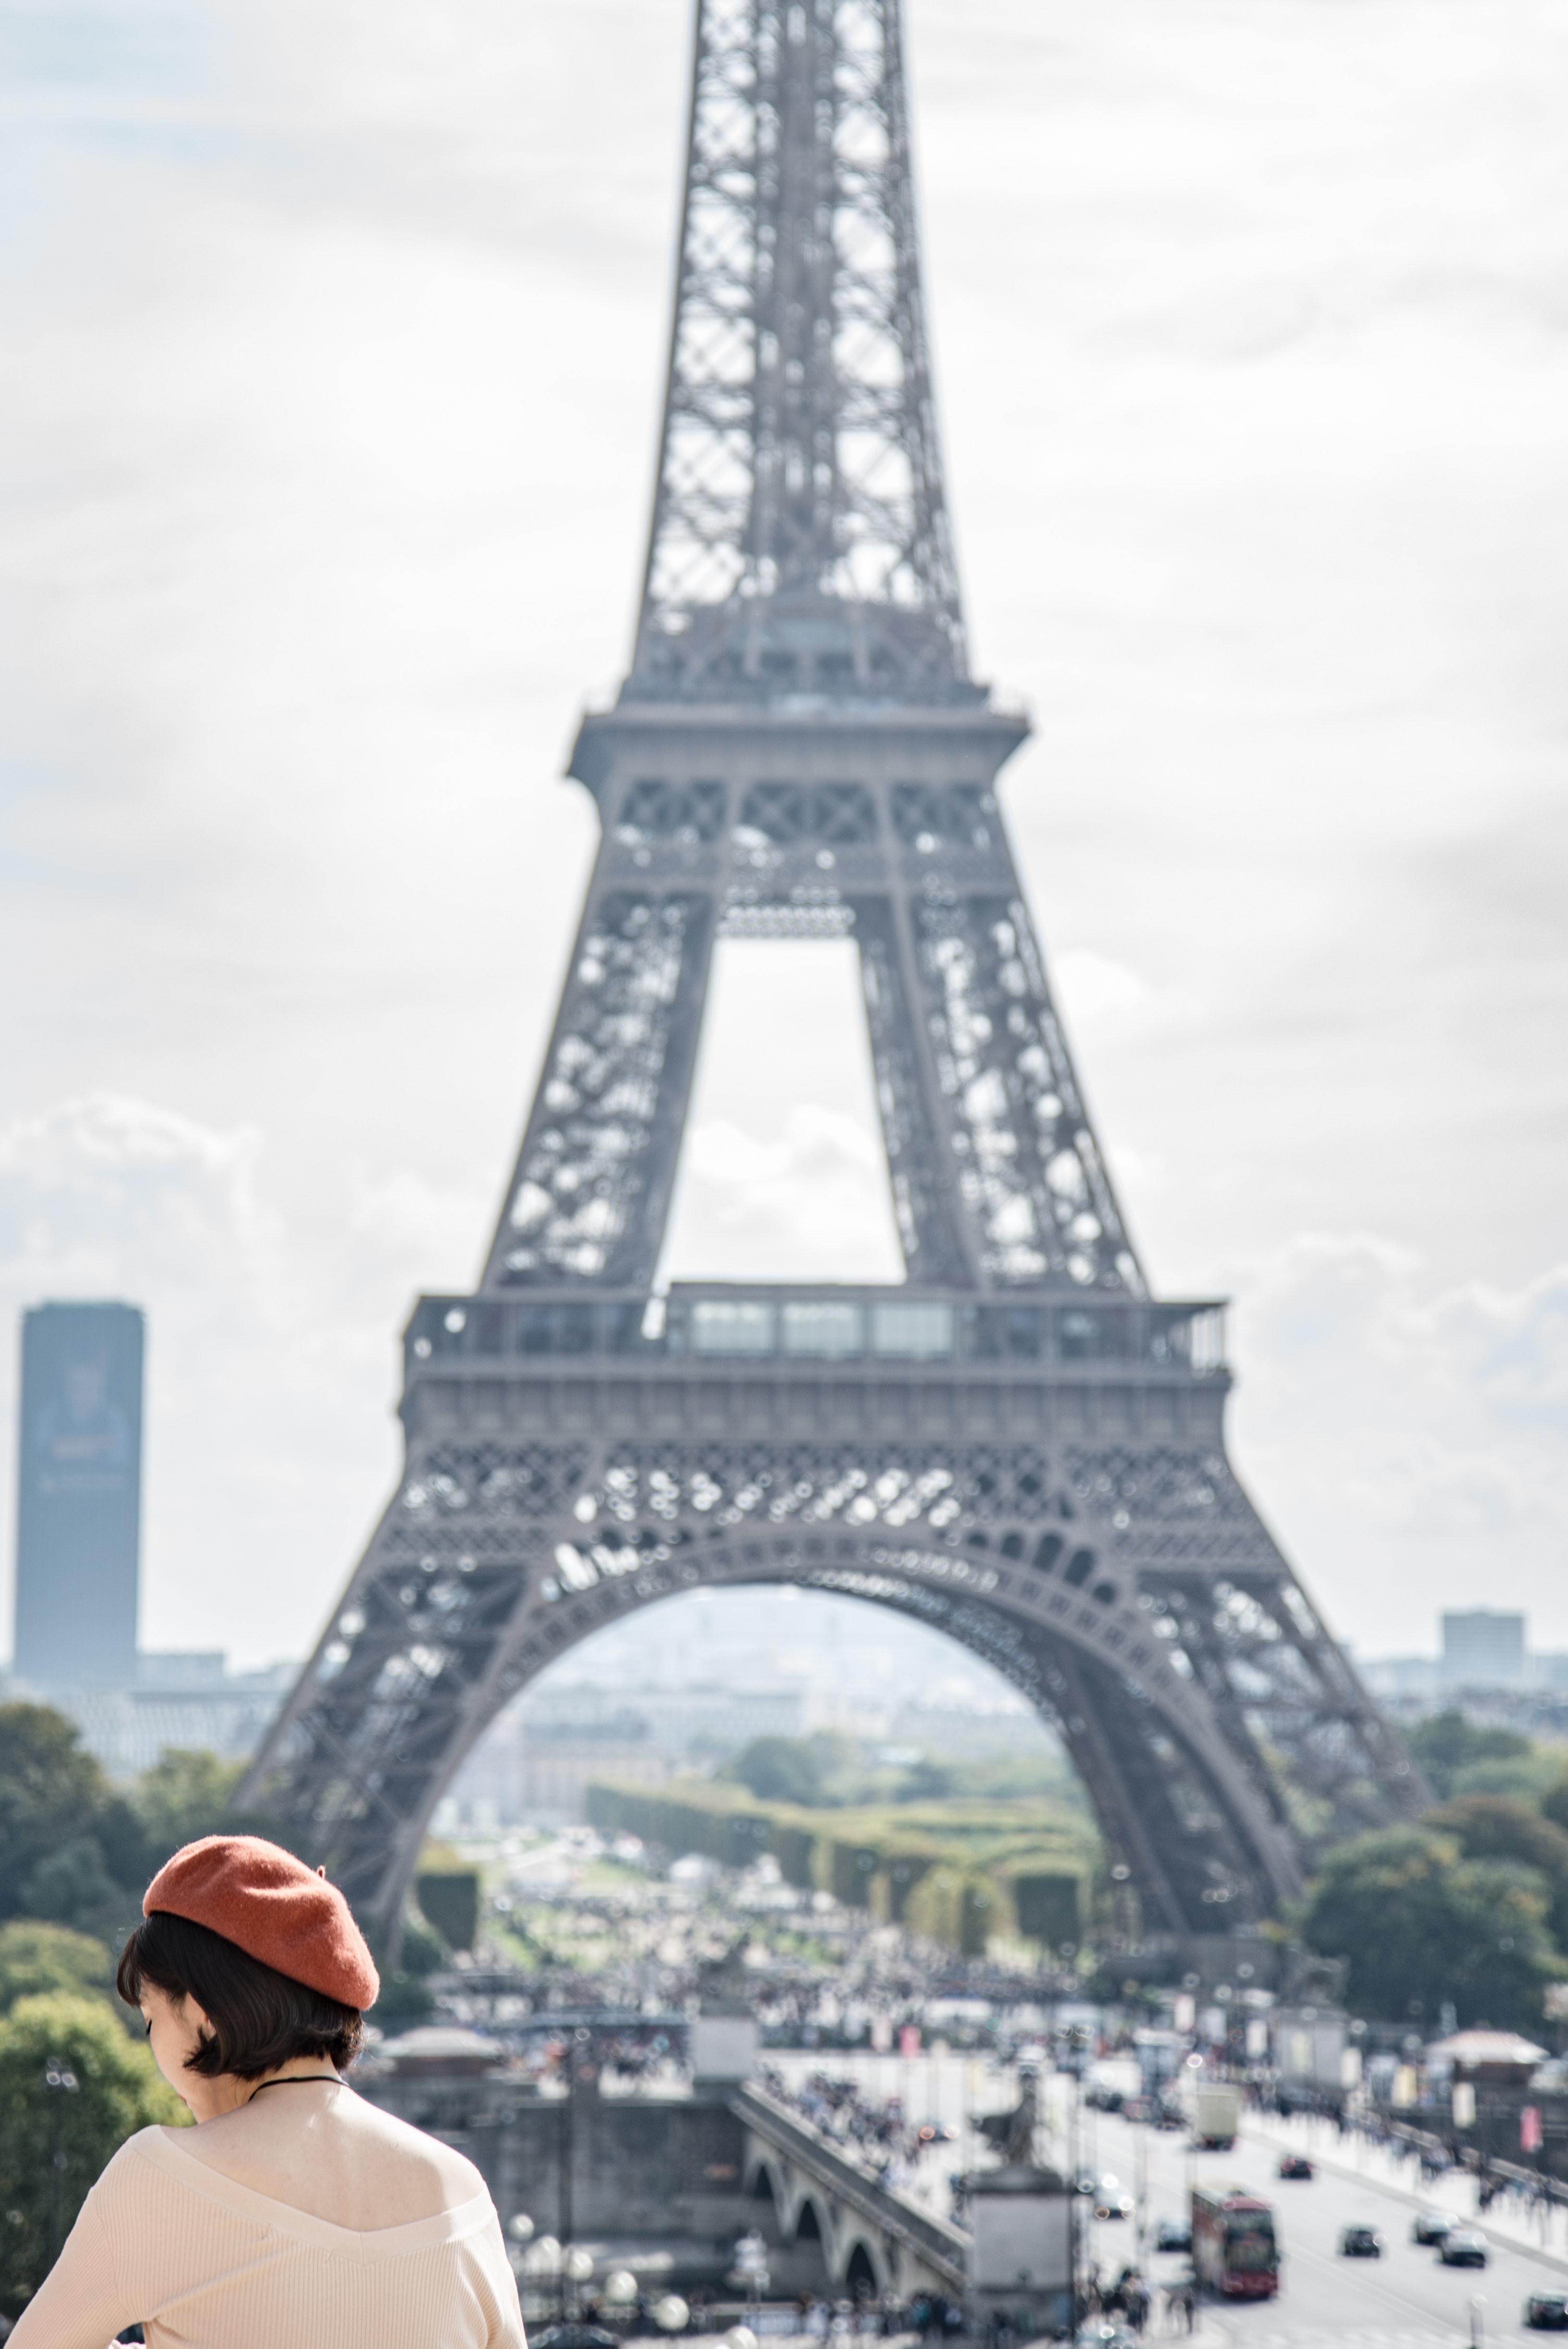 Eiffel Tower Scenery 183 Free Stock Photo